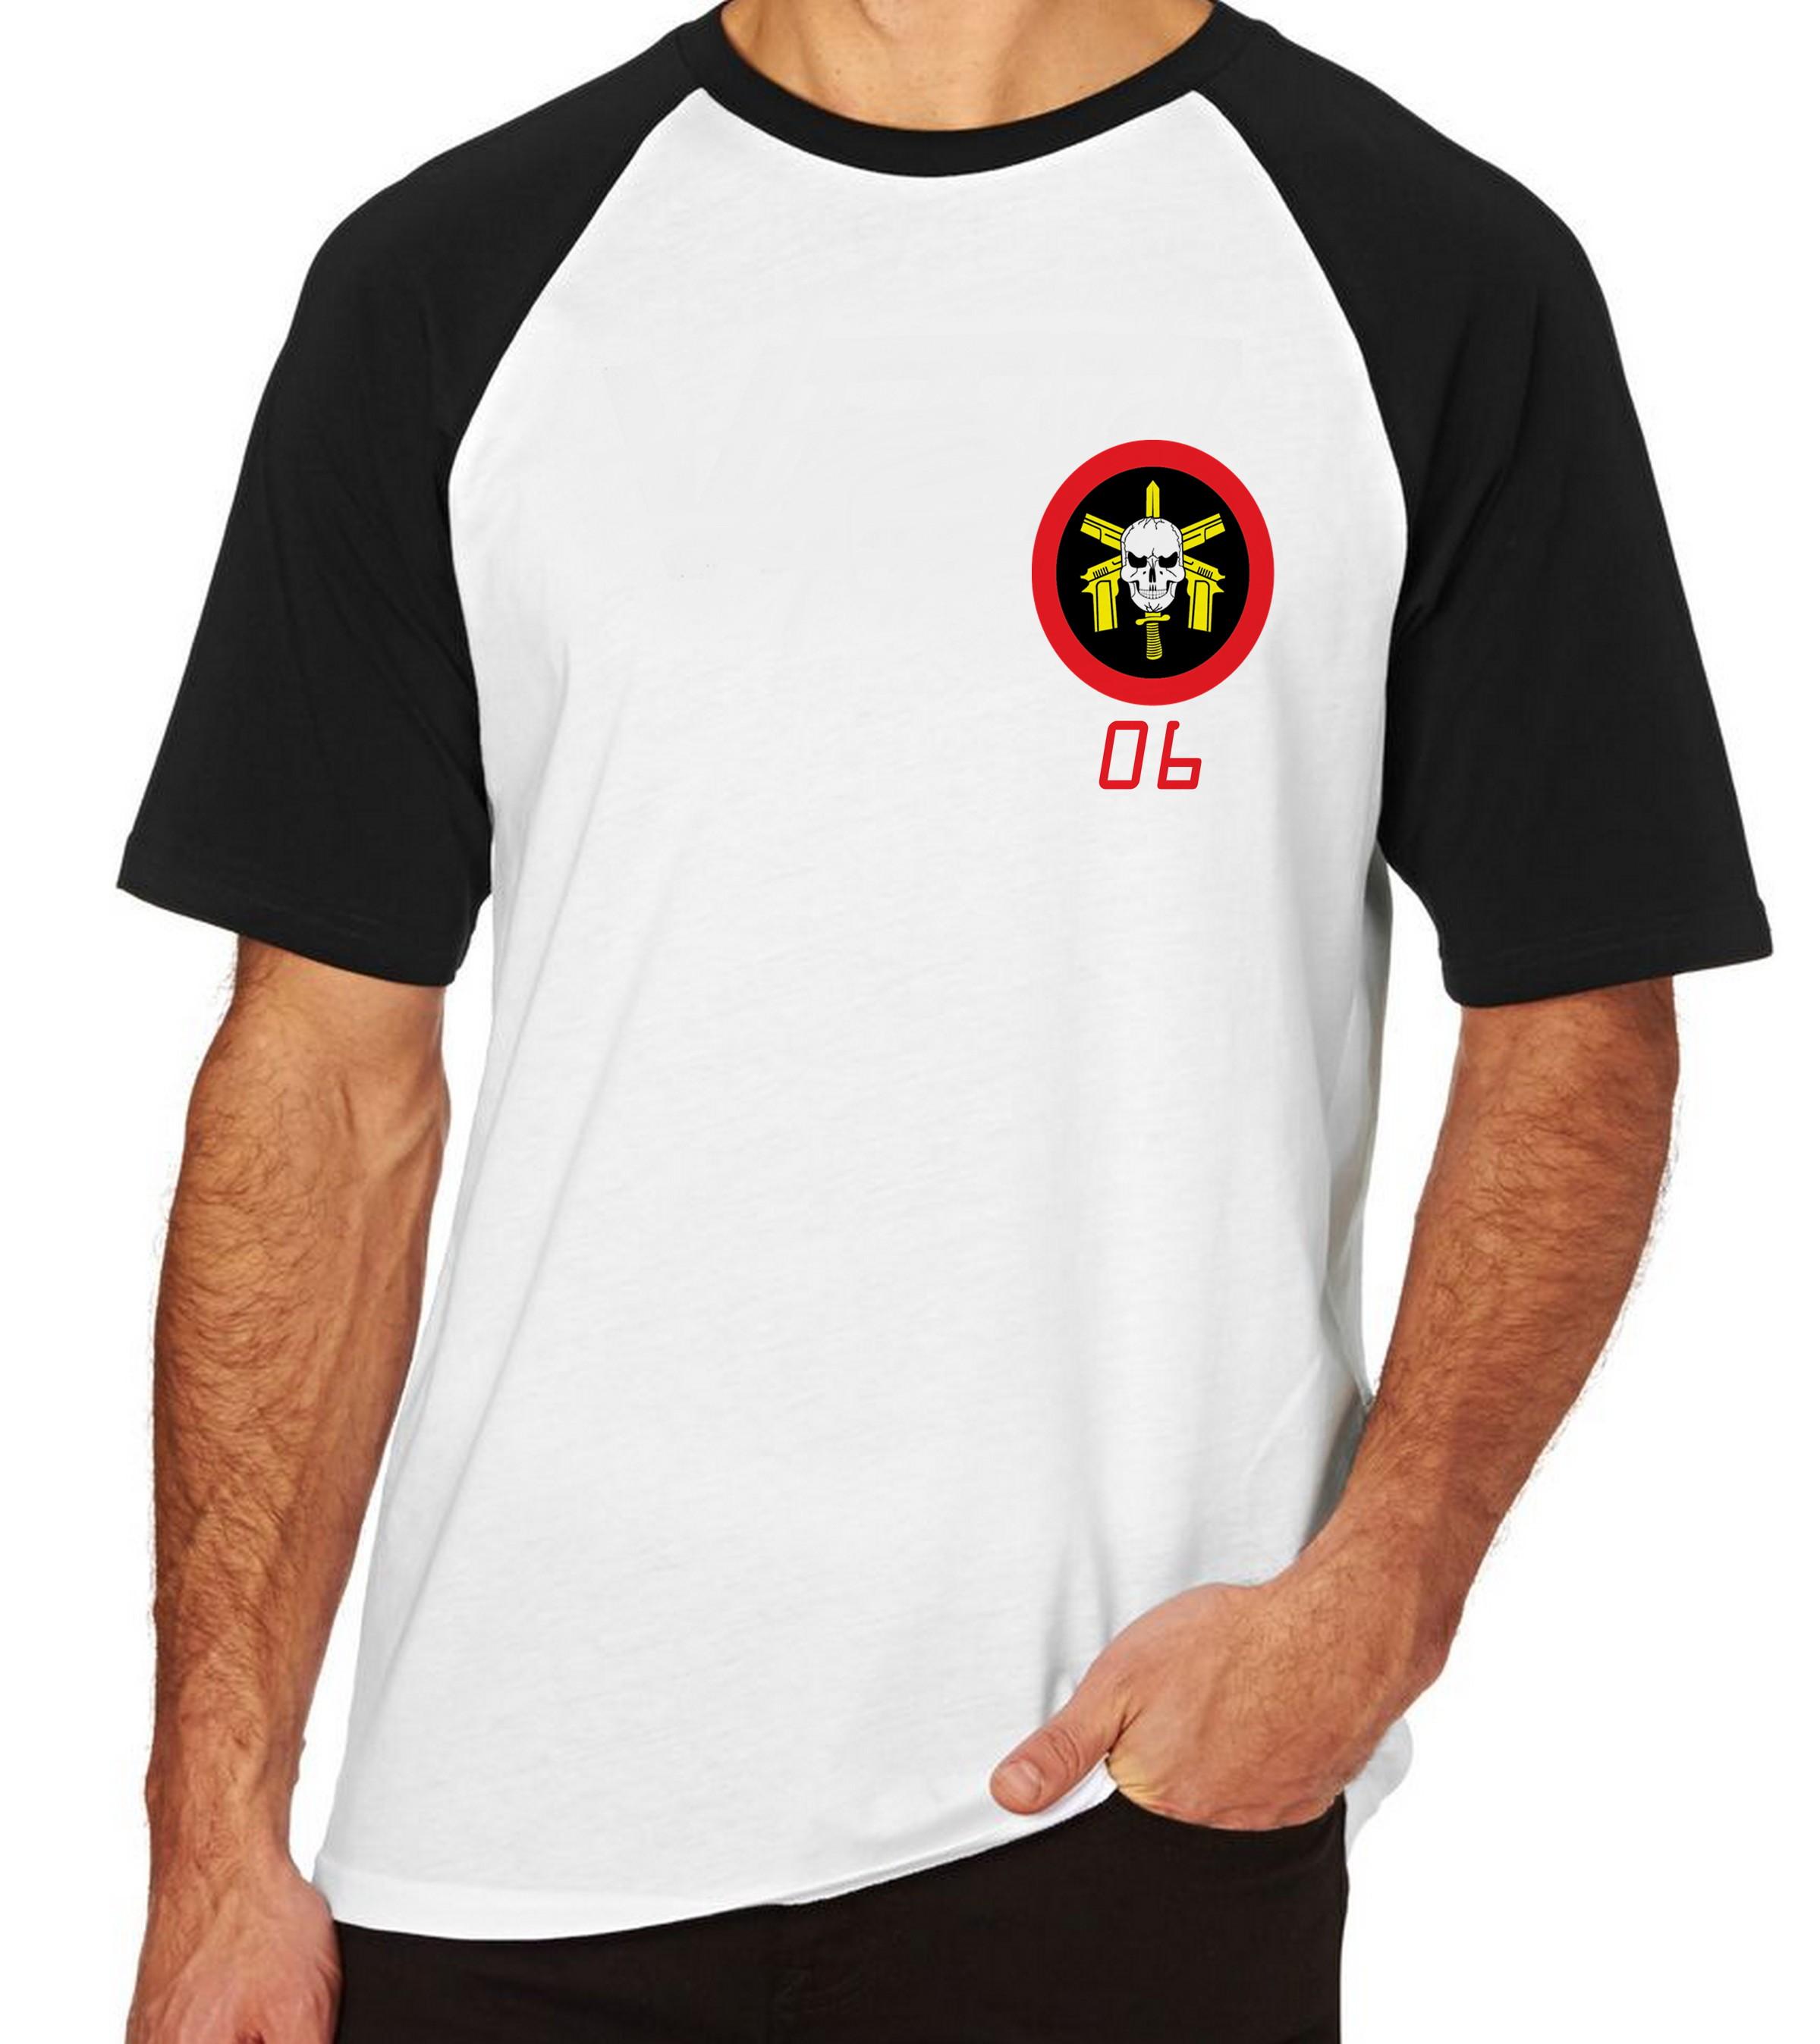 3ad3a62b32 Camisa Bope